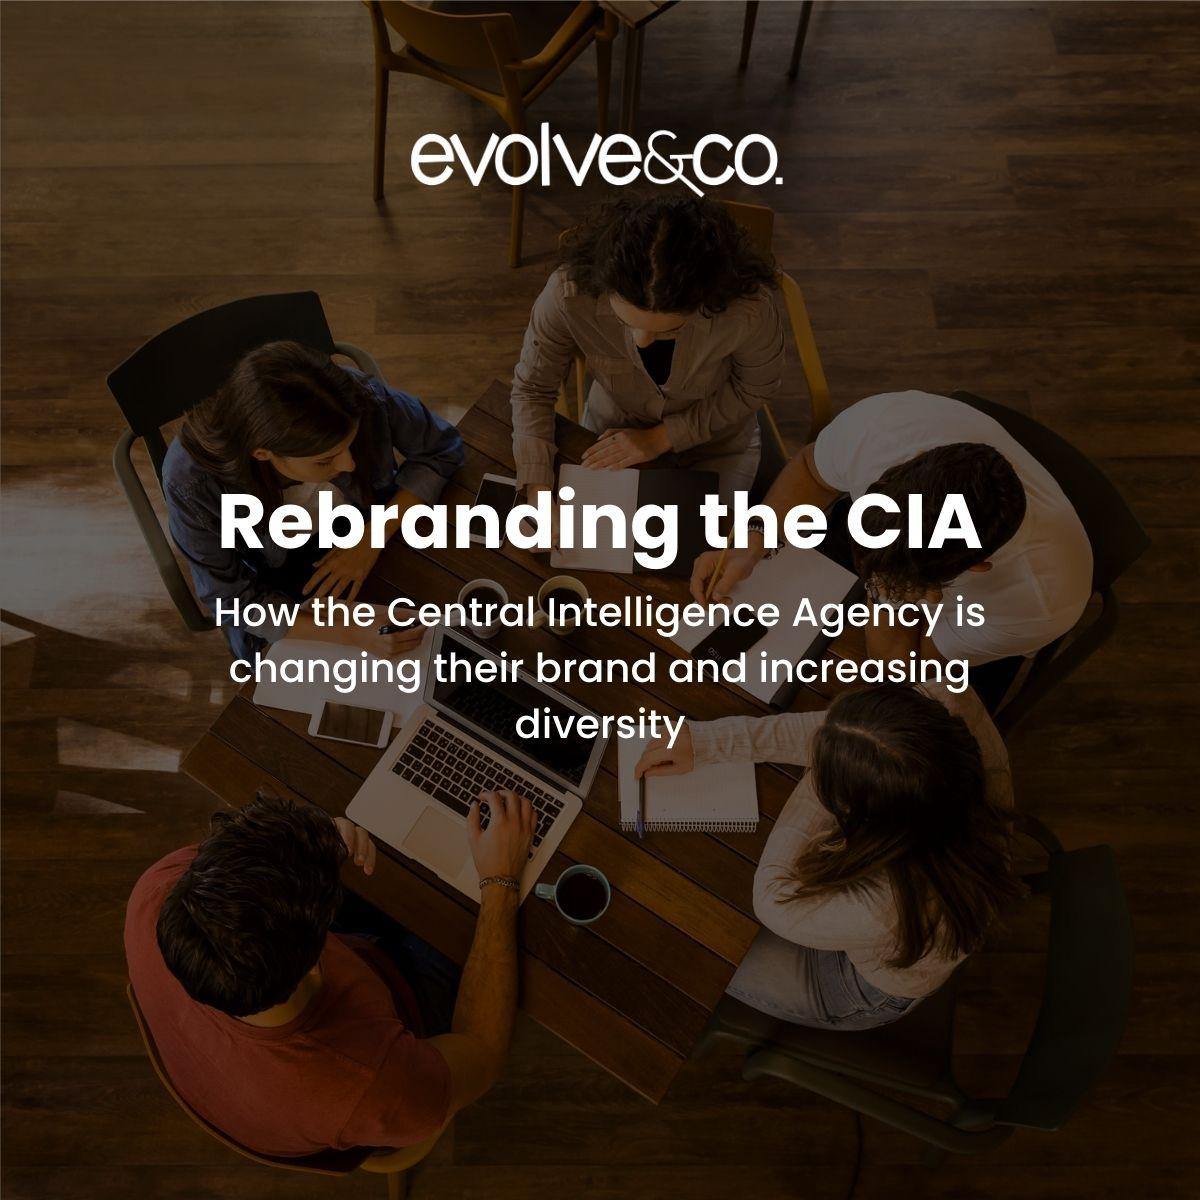 Rebranding the CIA